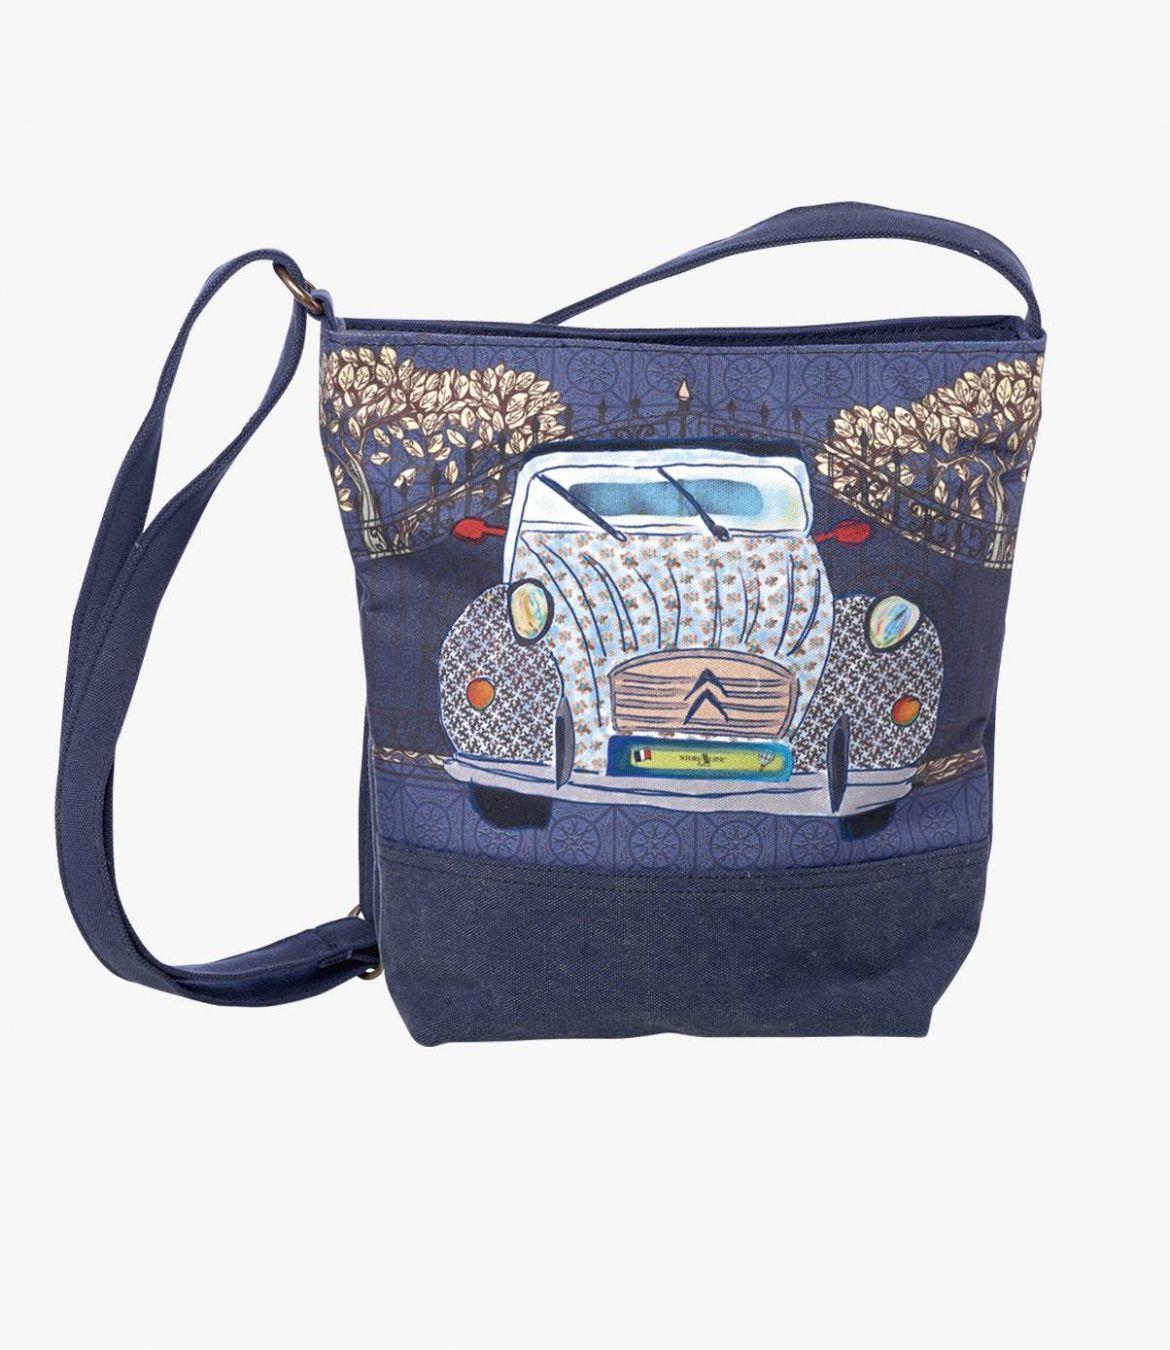 SLING GRETA Polyester Bag, Cotton, Women's Leather 33 x 10 x 28 cm Storiatipic - 1